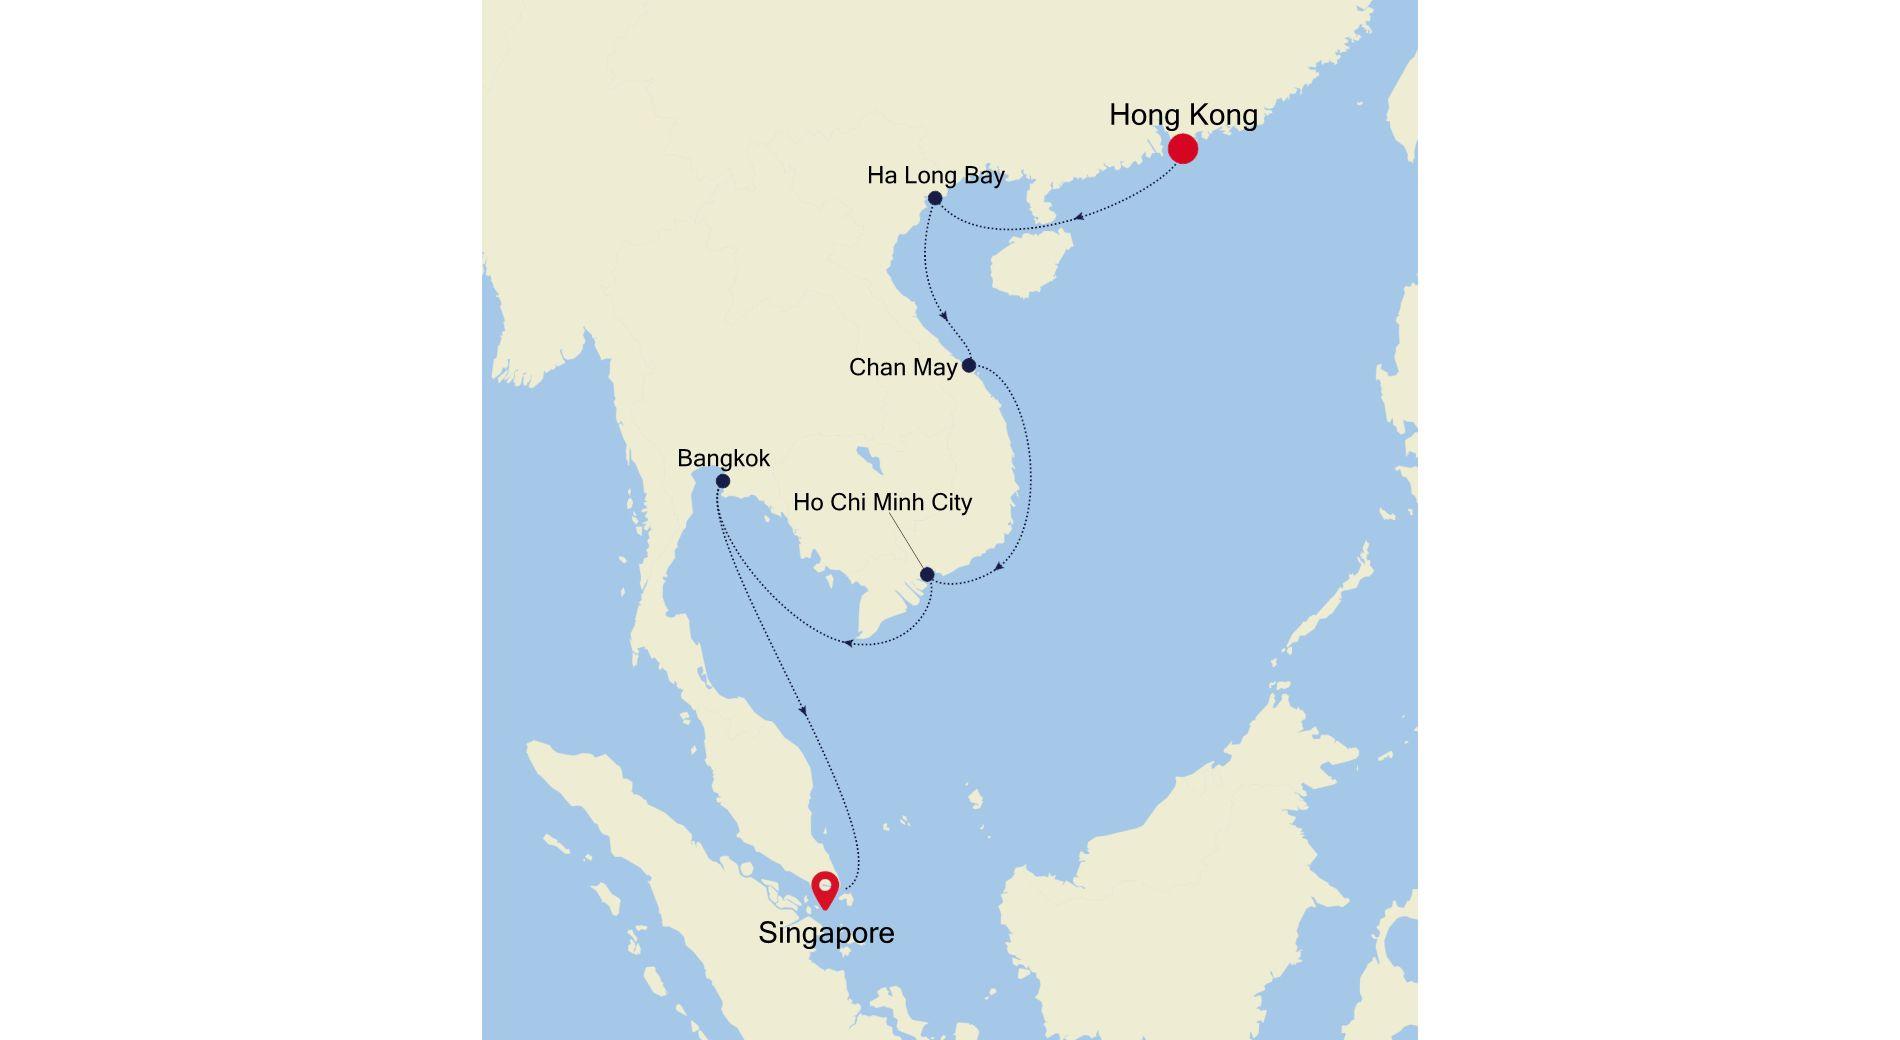 SM211023013 - Hong Kong nach Singapore